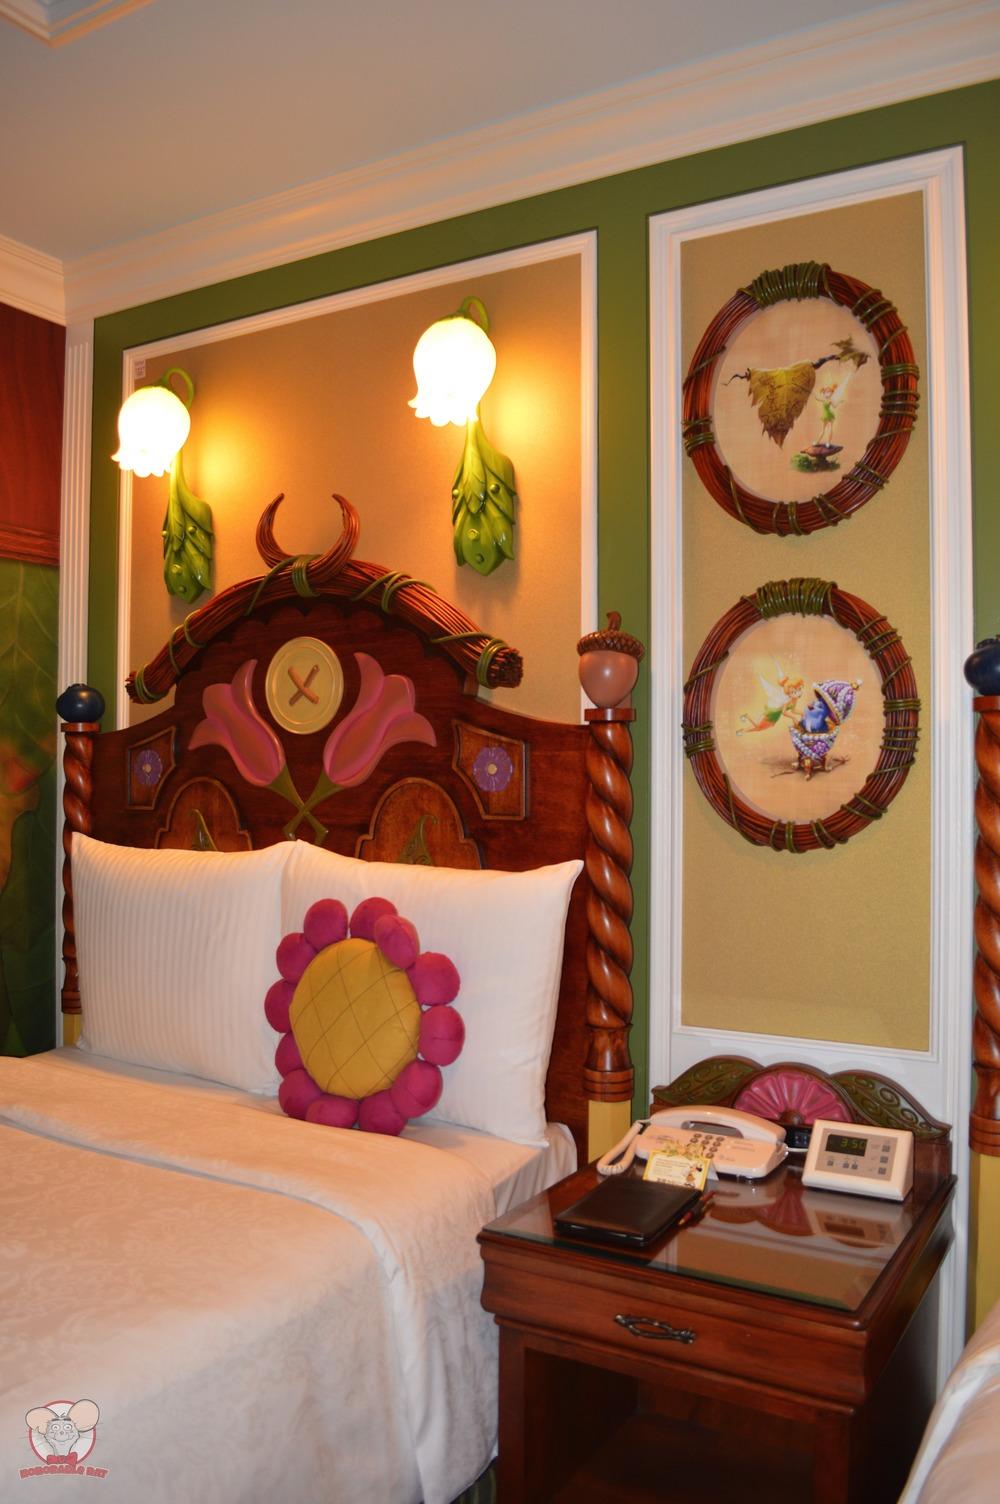 Tokyo Disneyland Hotel Tinker Bell Room